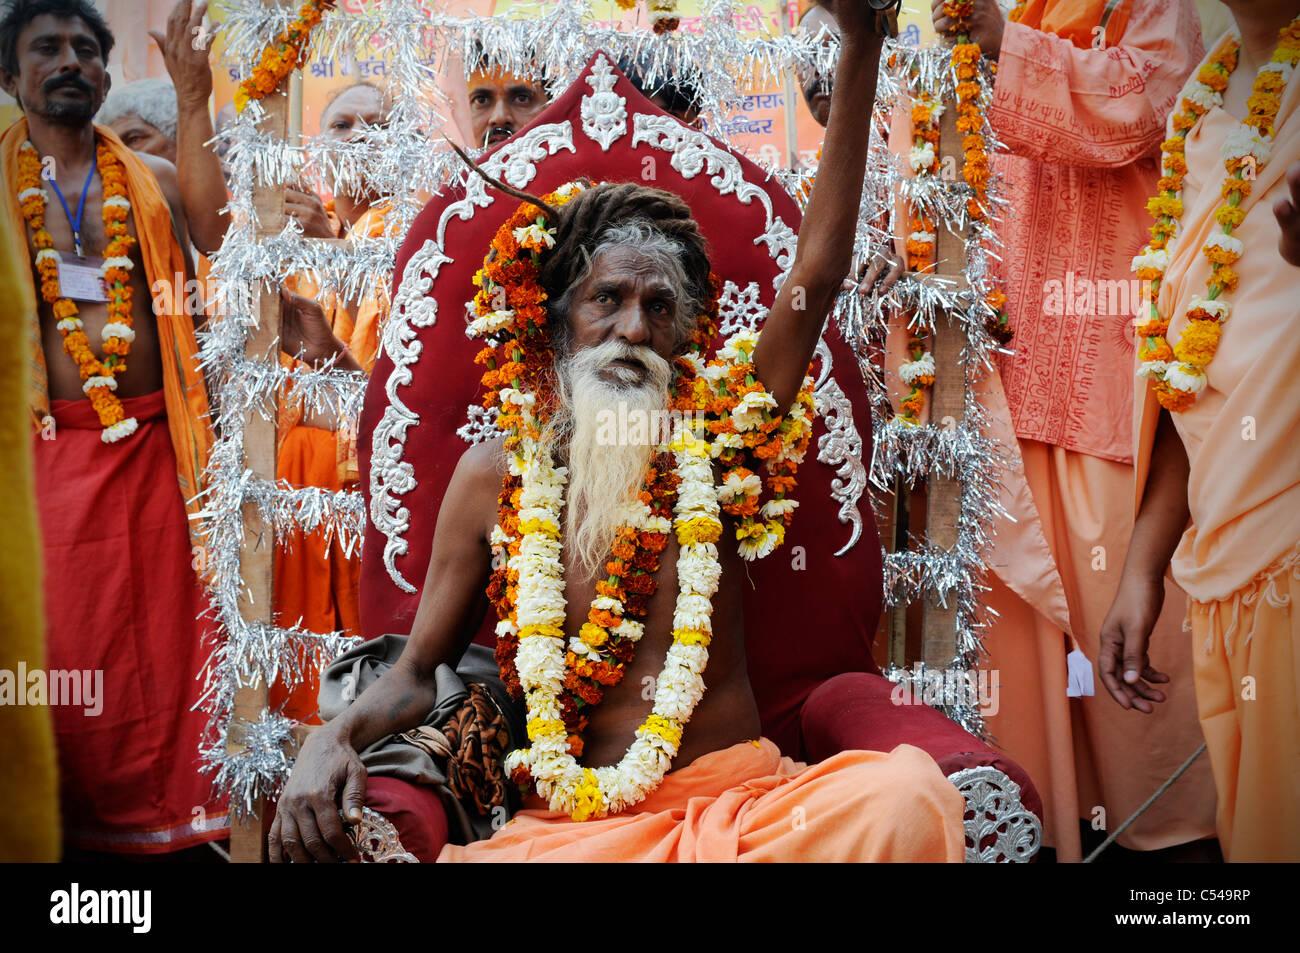 A sadhu (Hindu holy man) at the Kumbh Mela festival in India. Stock Photo